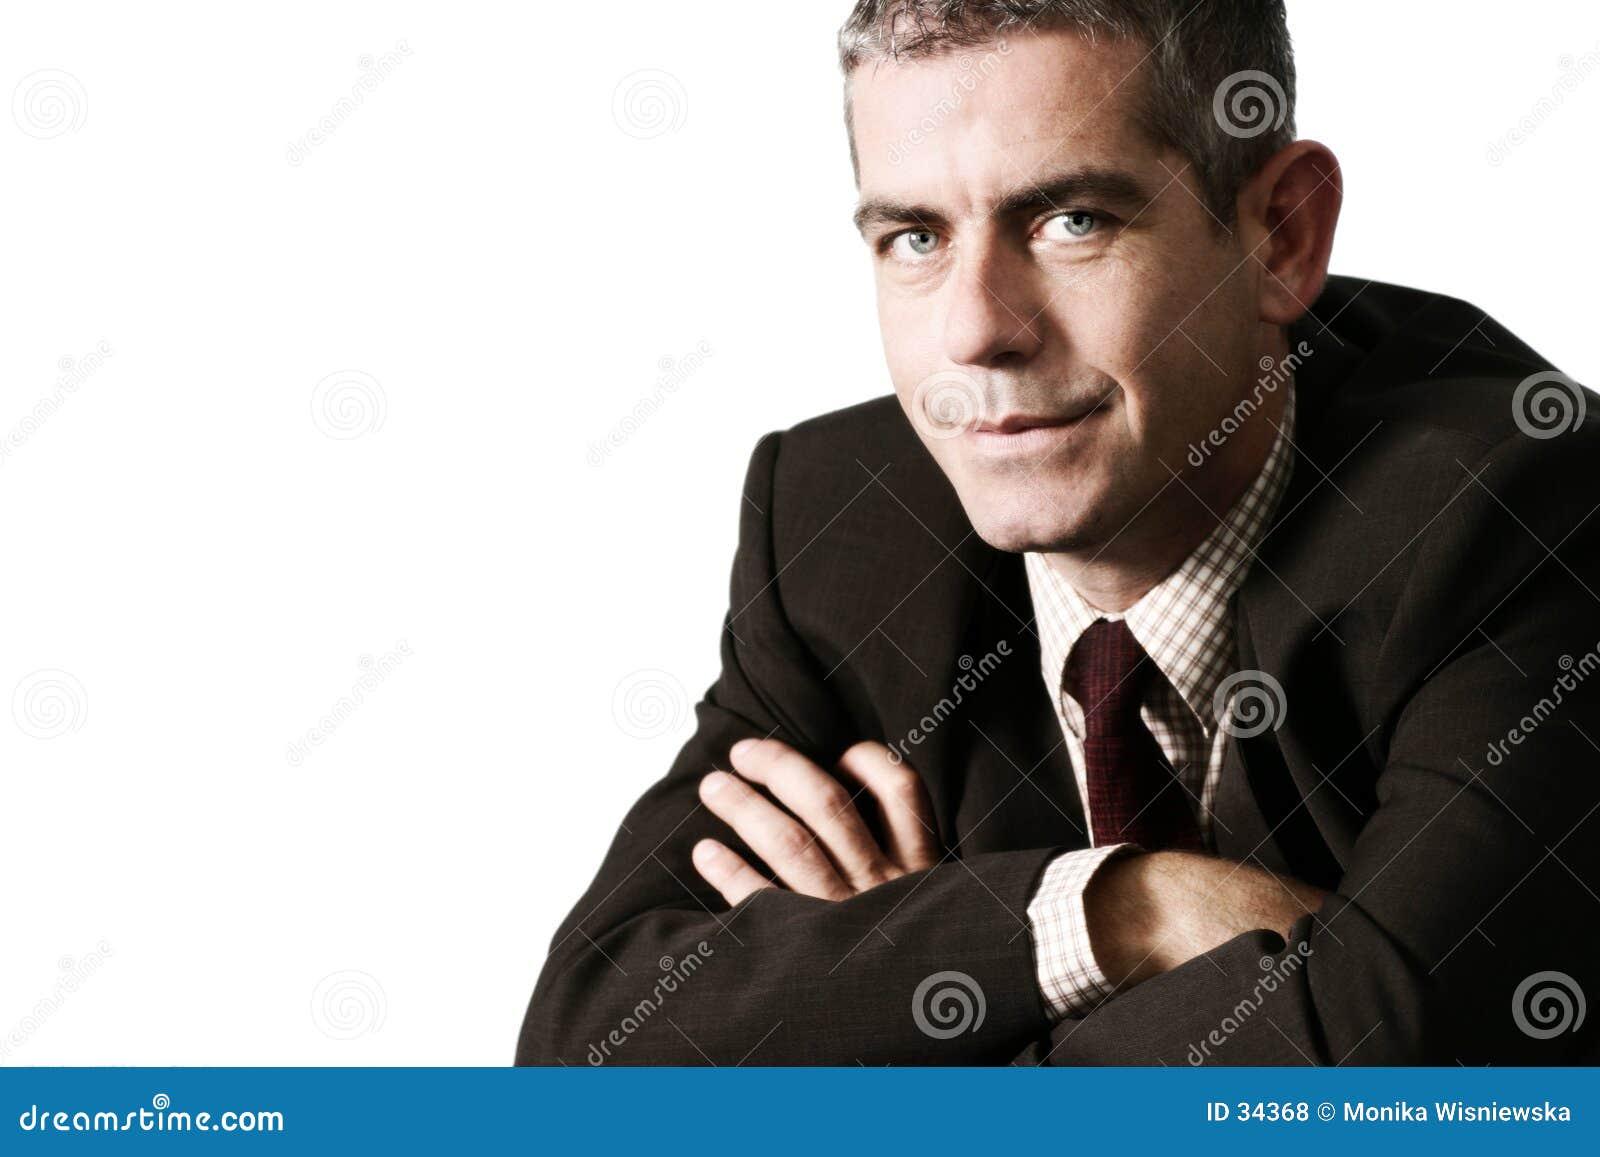 Business People - Businessman